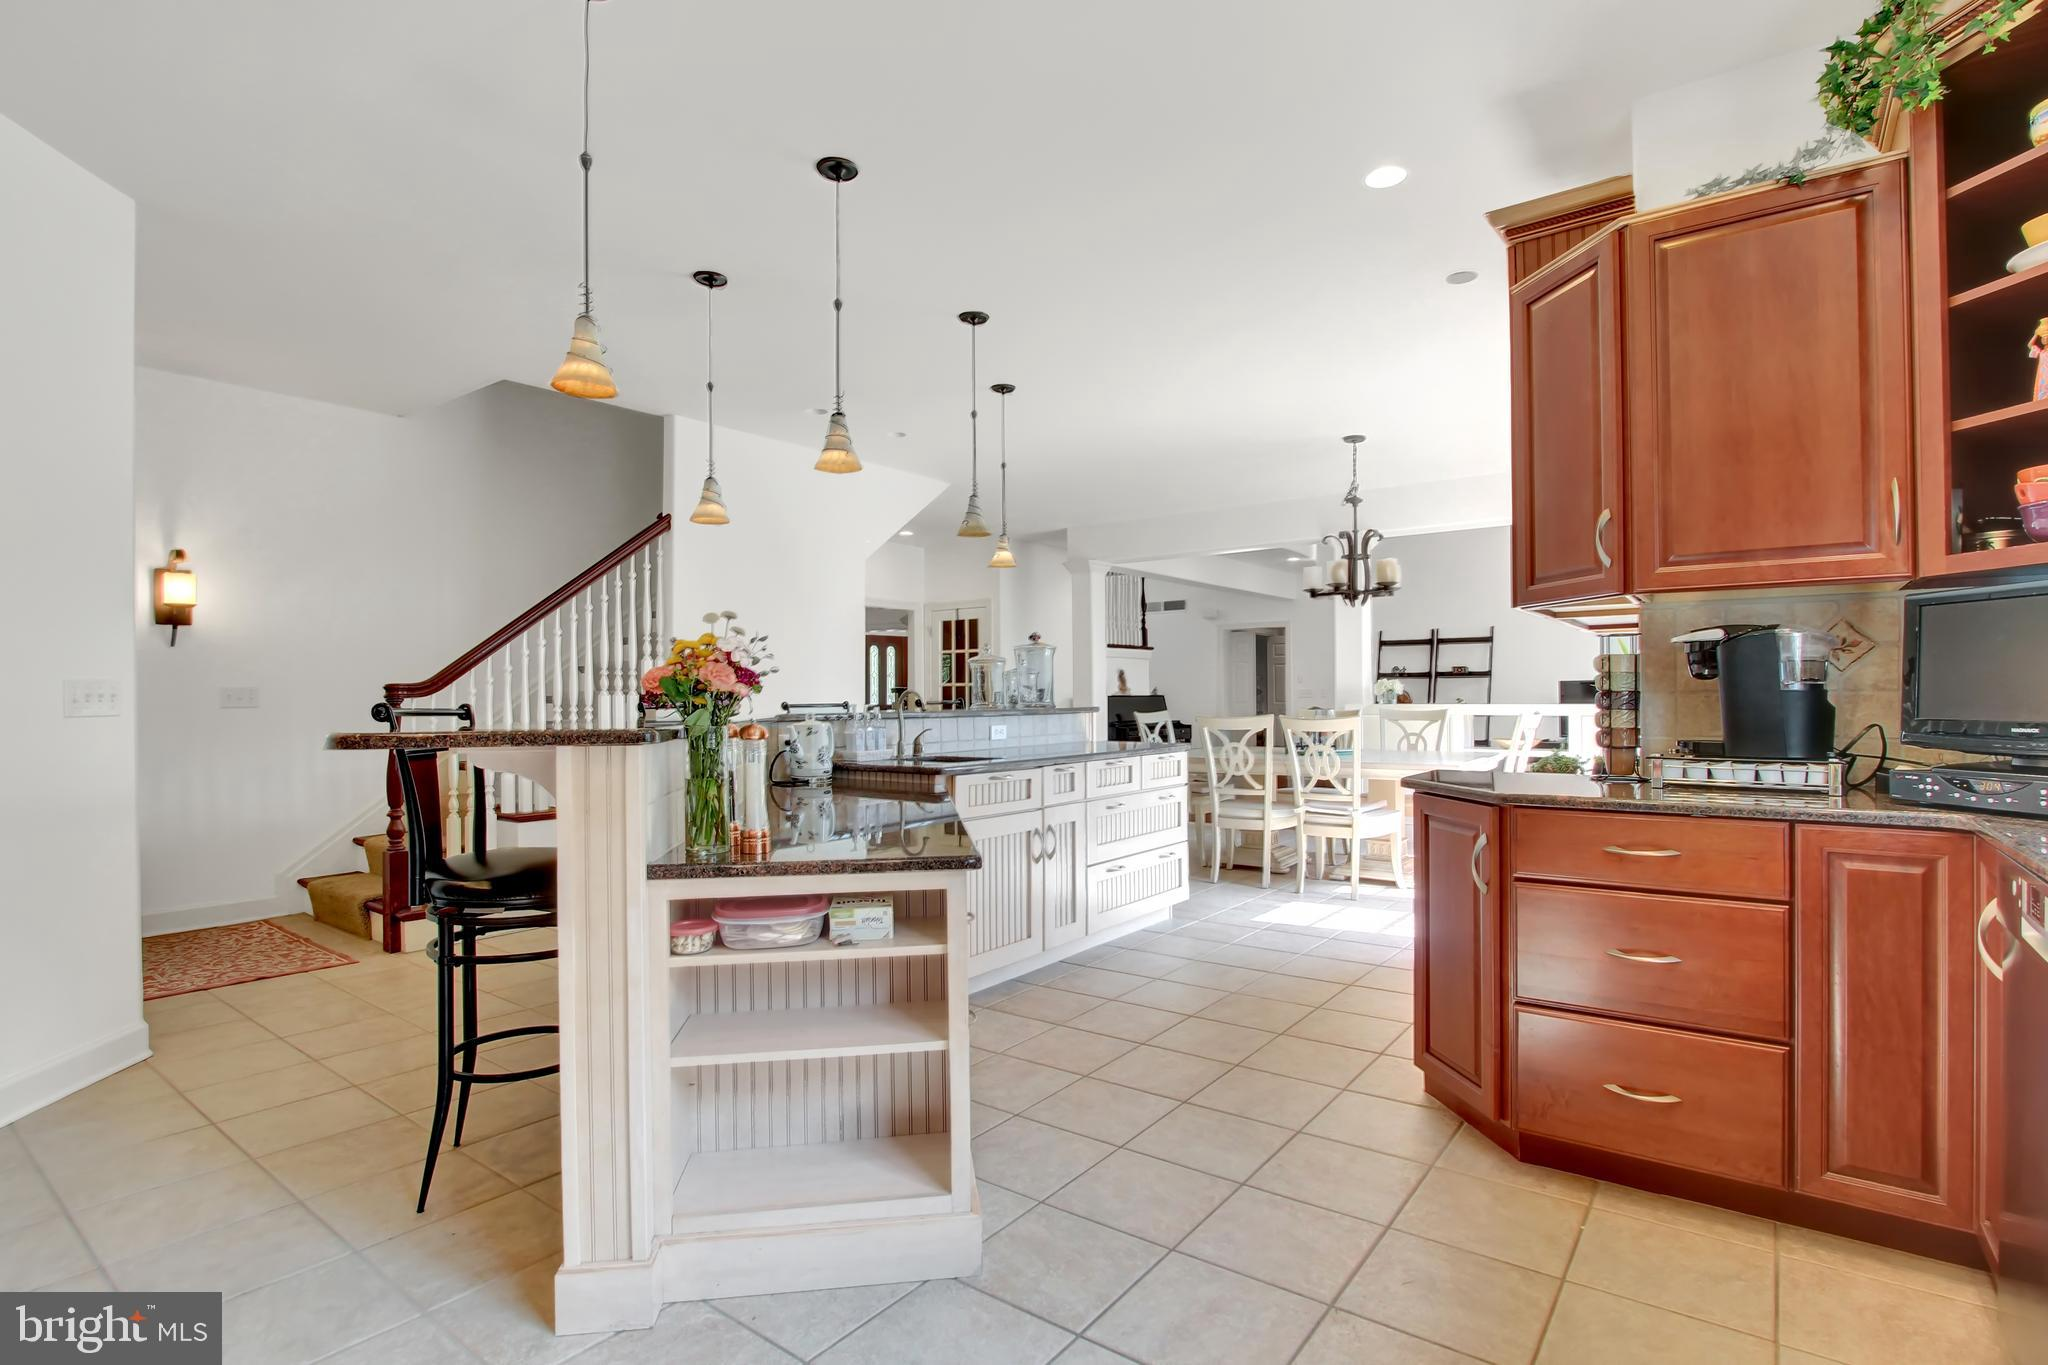 Clean, sleek white walls, cherry cabinets